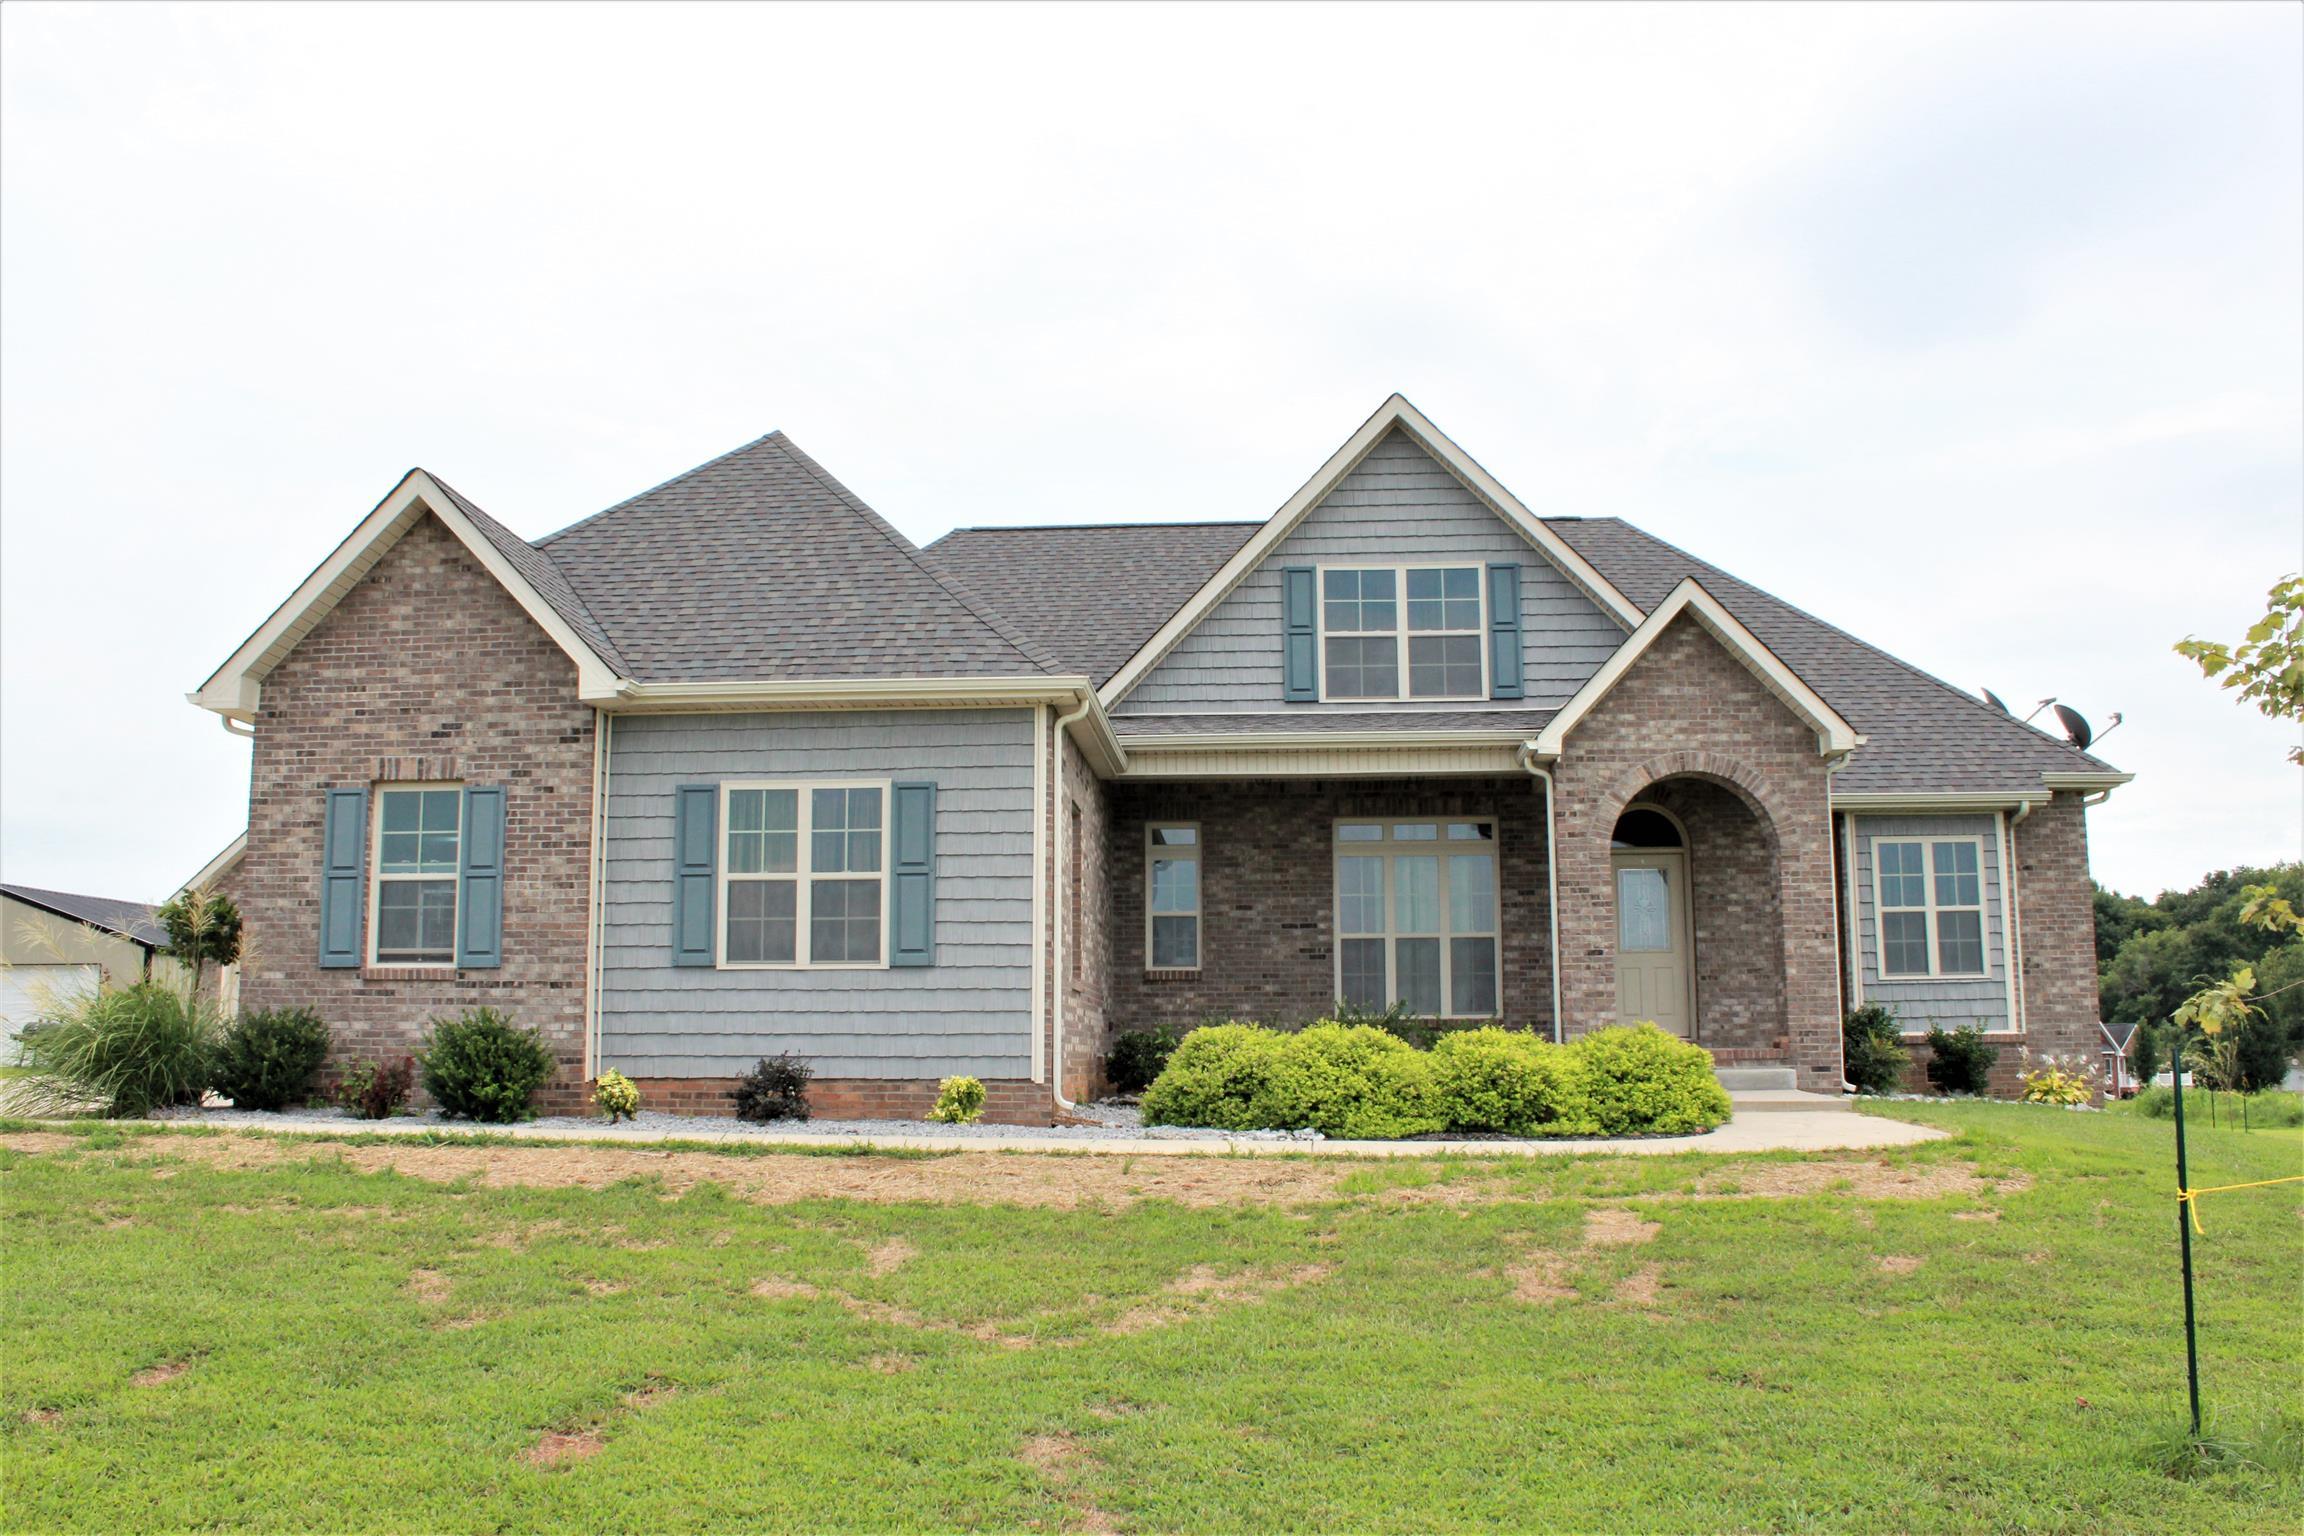 4515 Crossroads Dr, Clarksville, TN 37040 - Clarksville, TN real estate listing